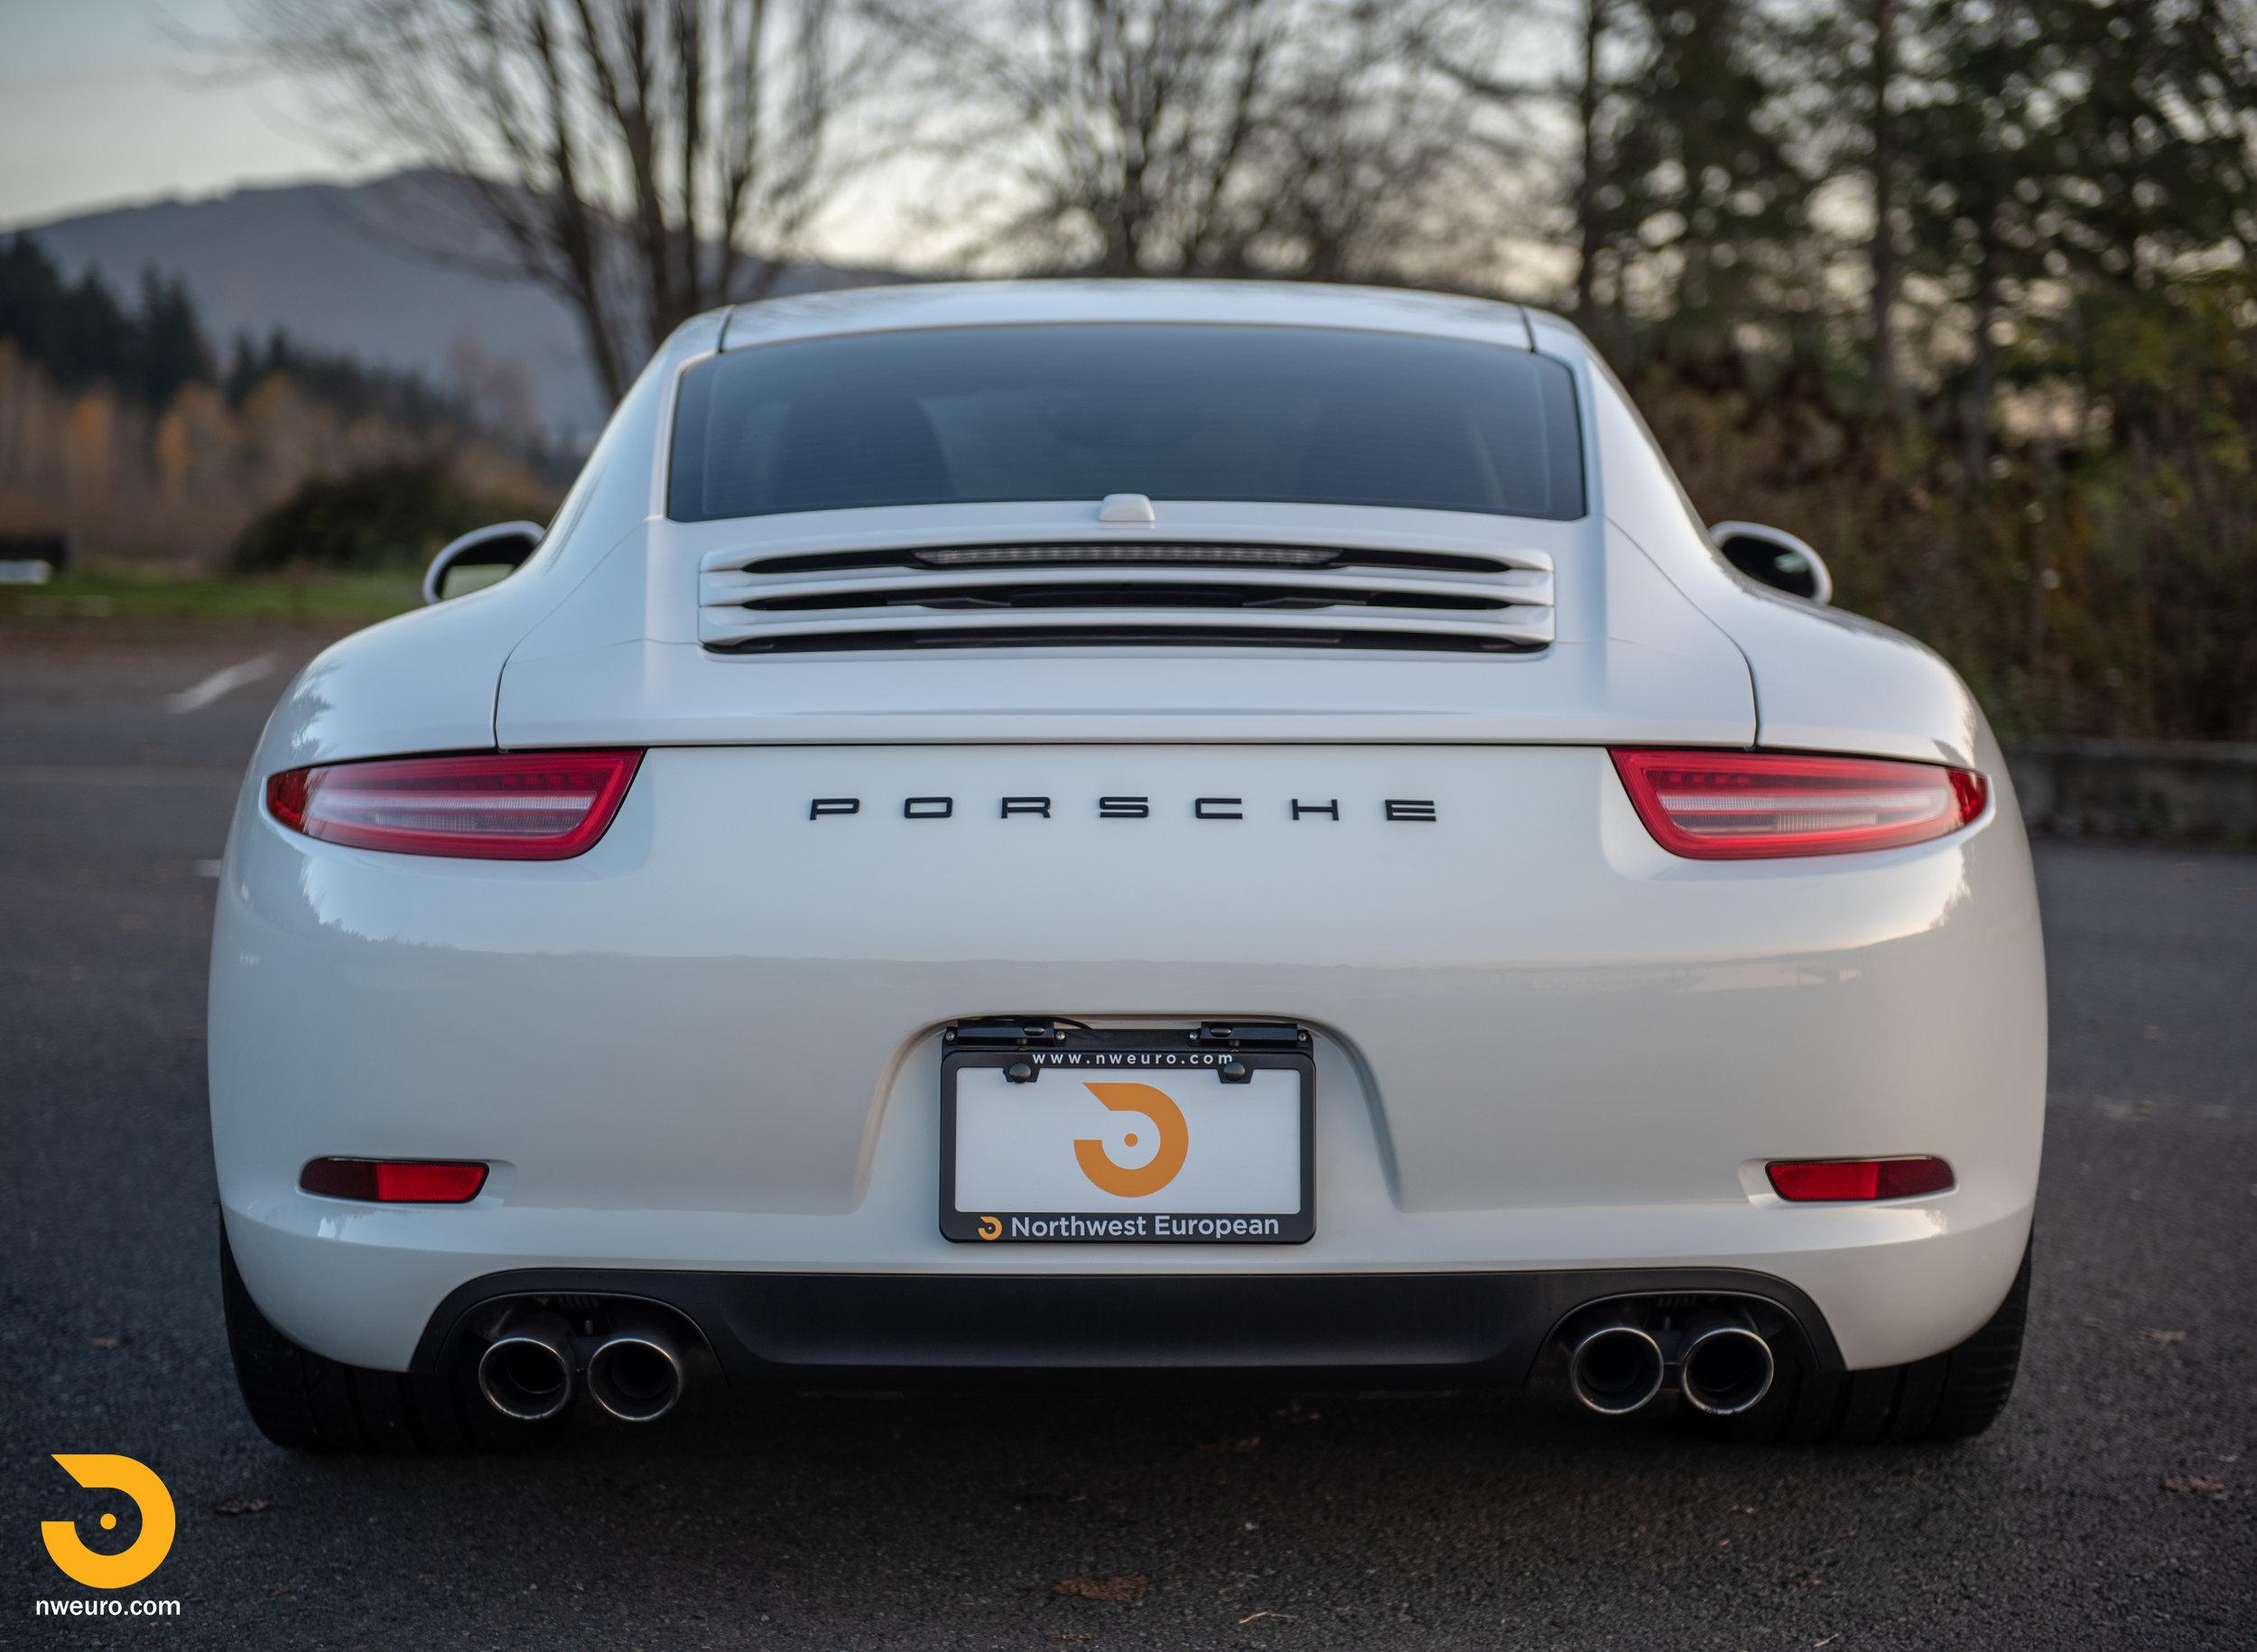 2012 Porsche Carrera S-20.jpg